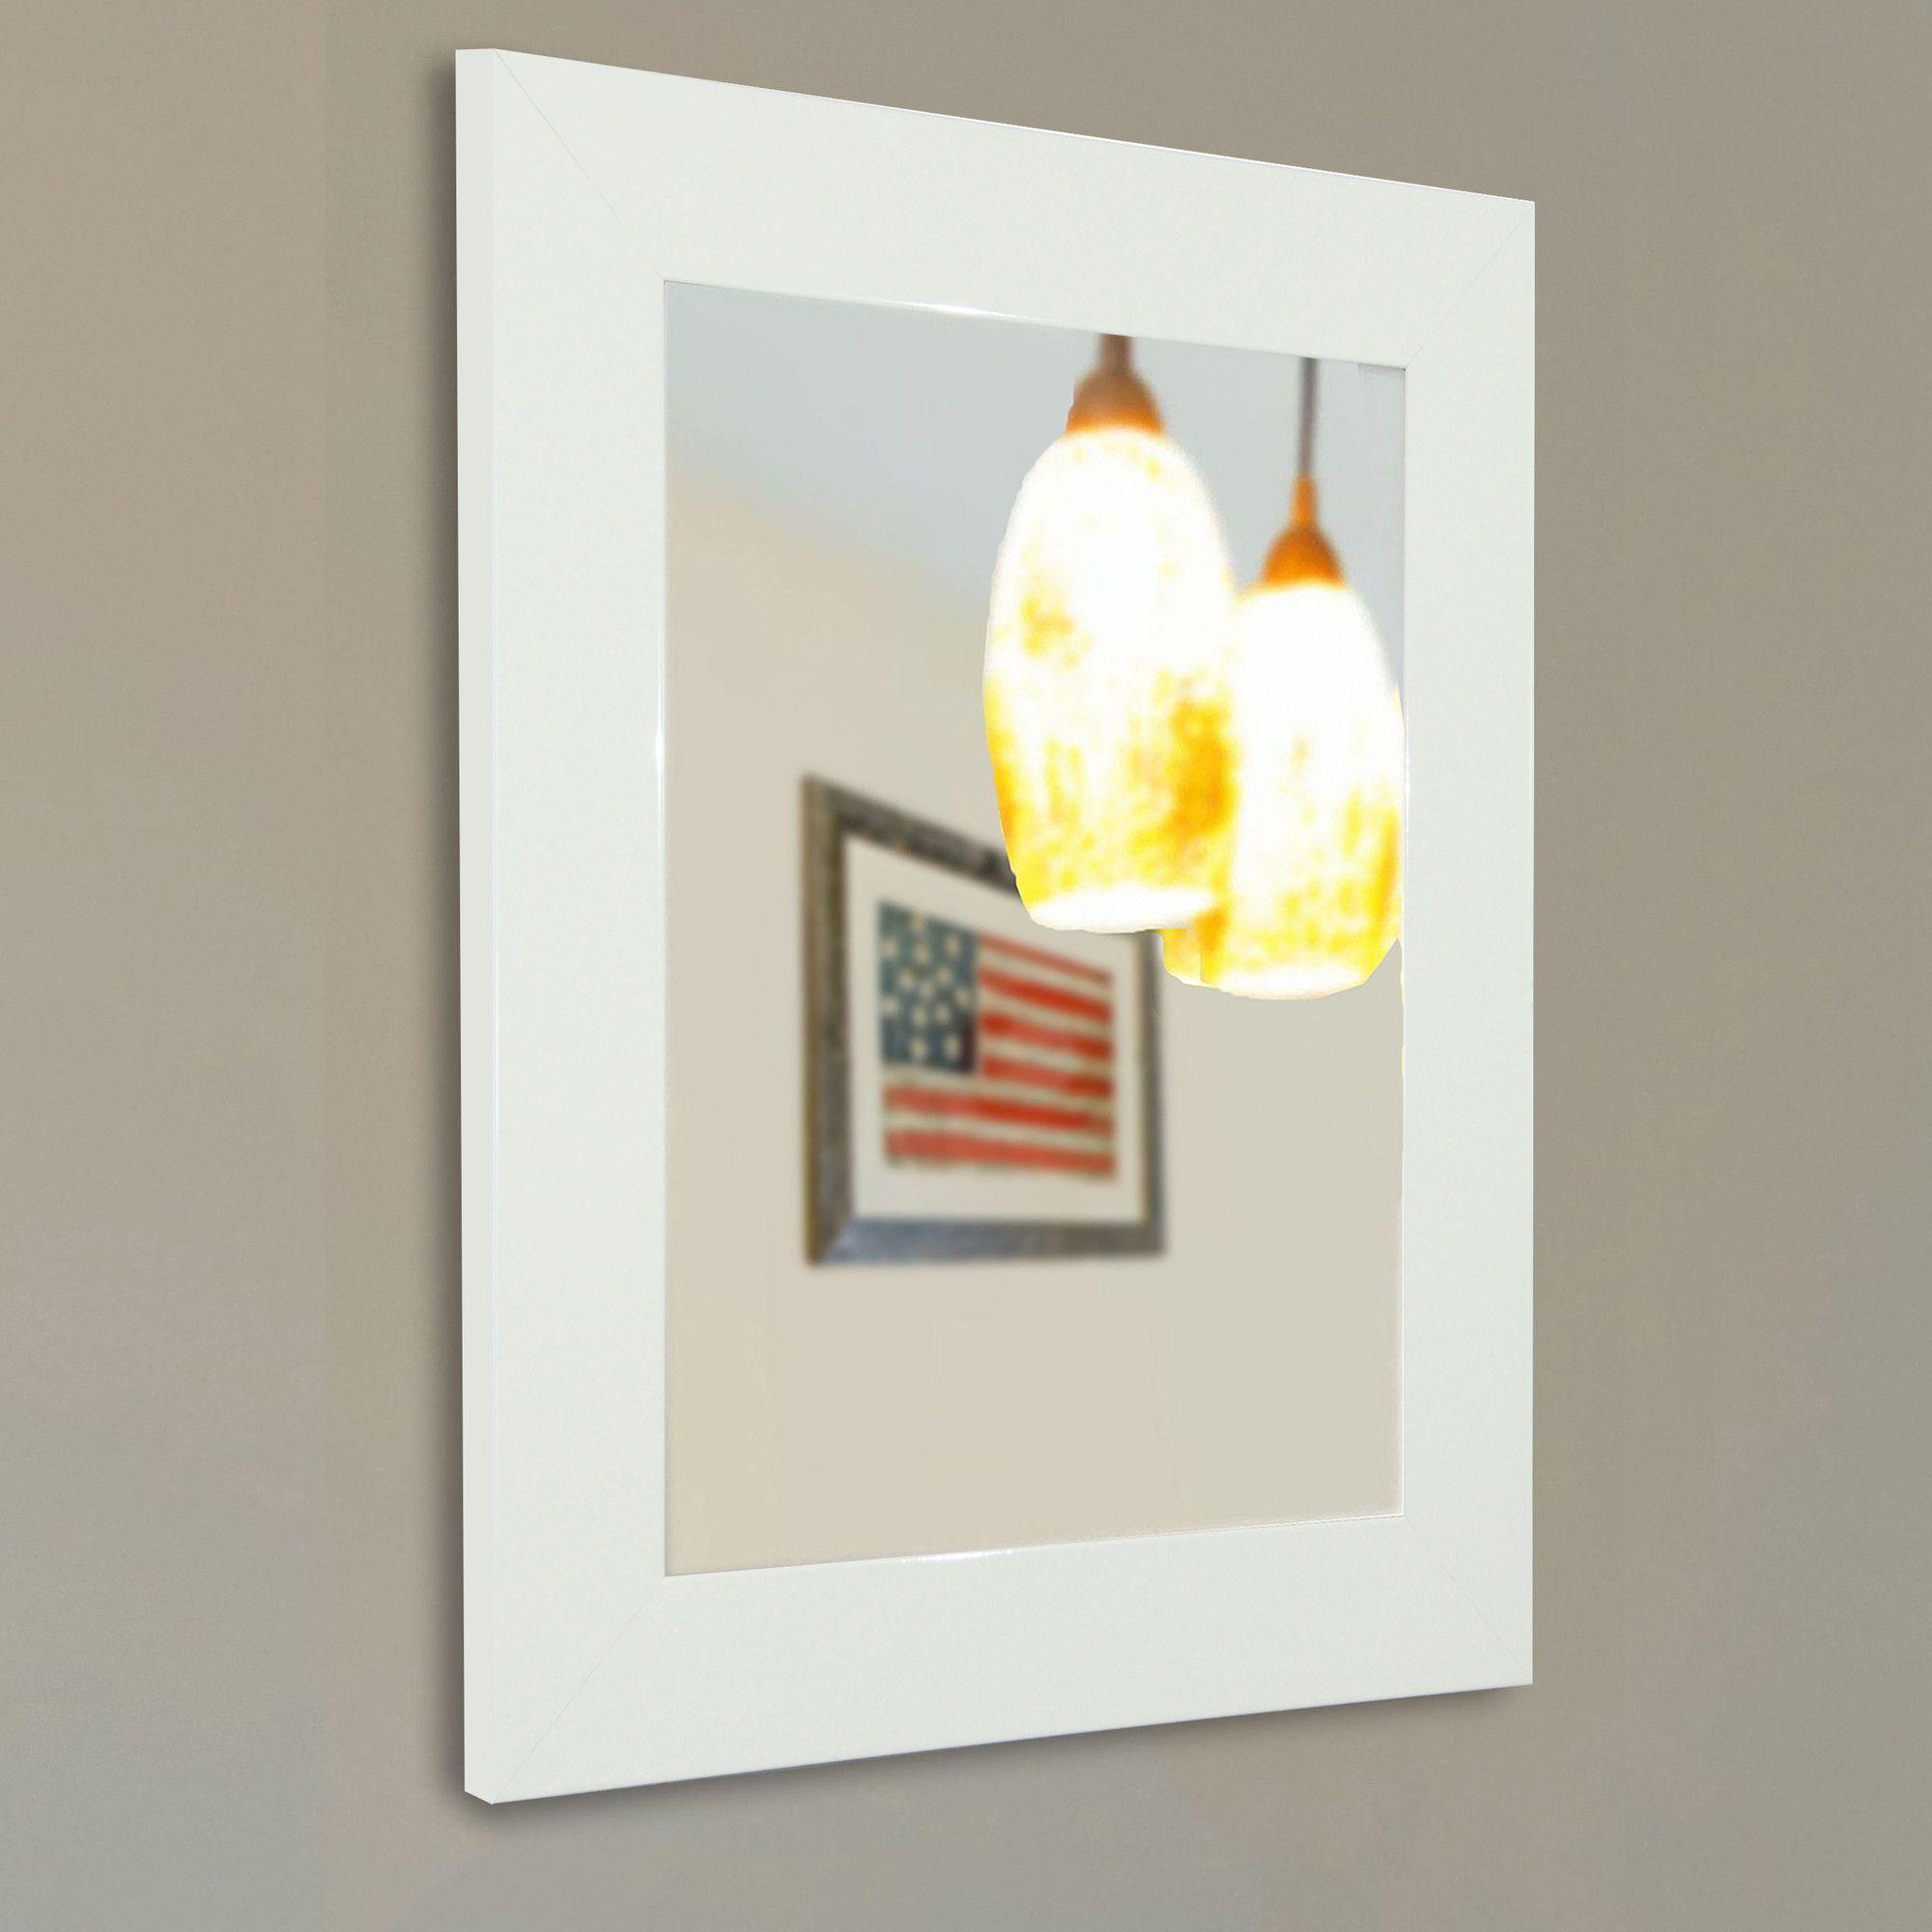 Albro Delta Wall Mirror   Products